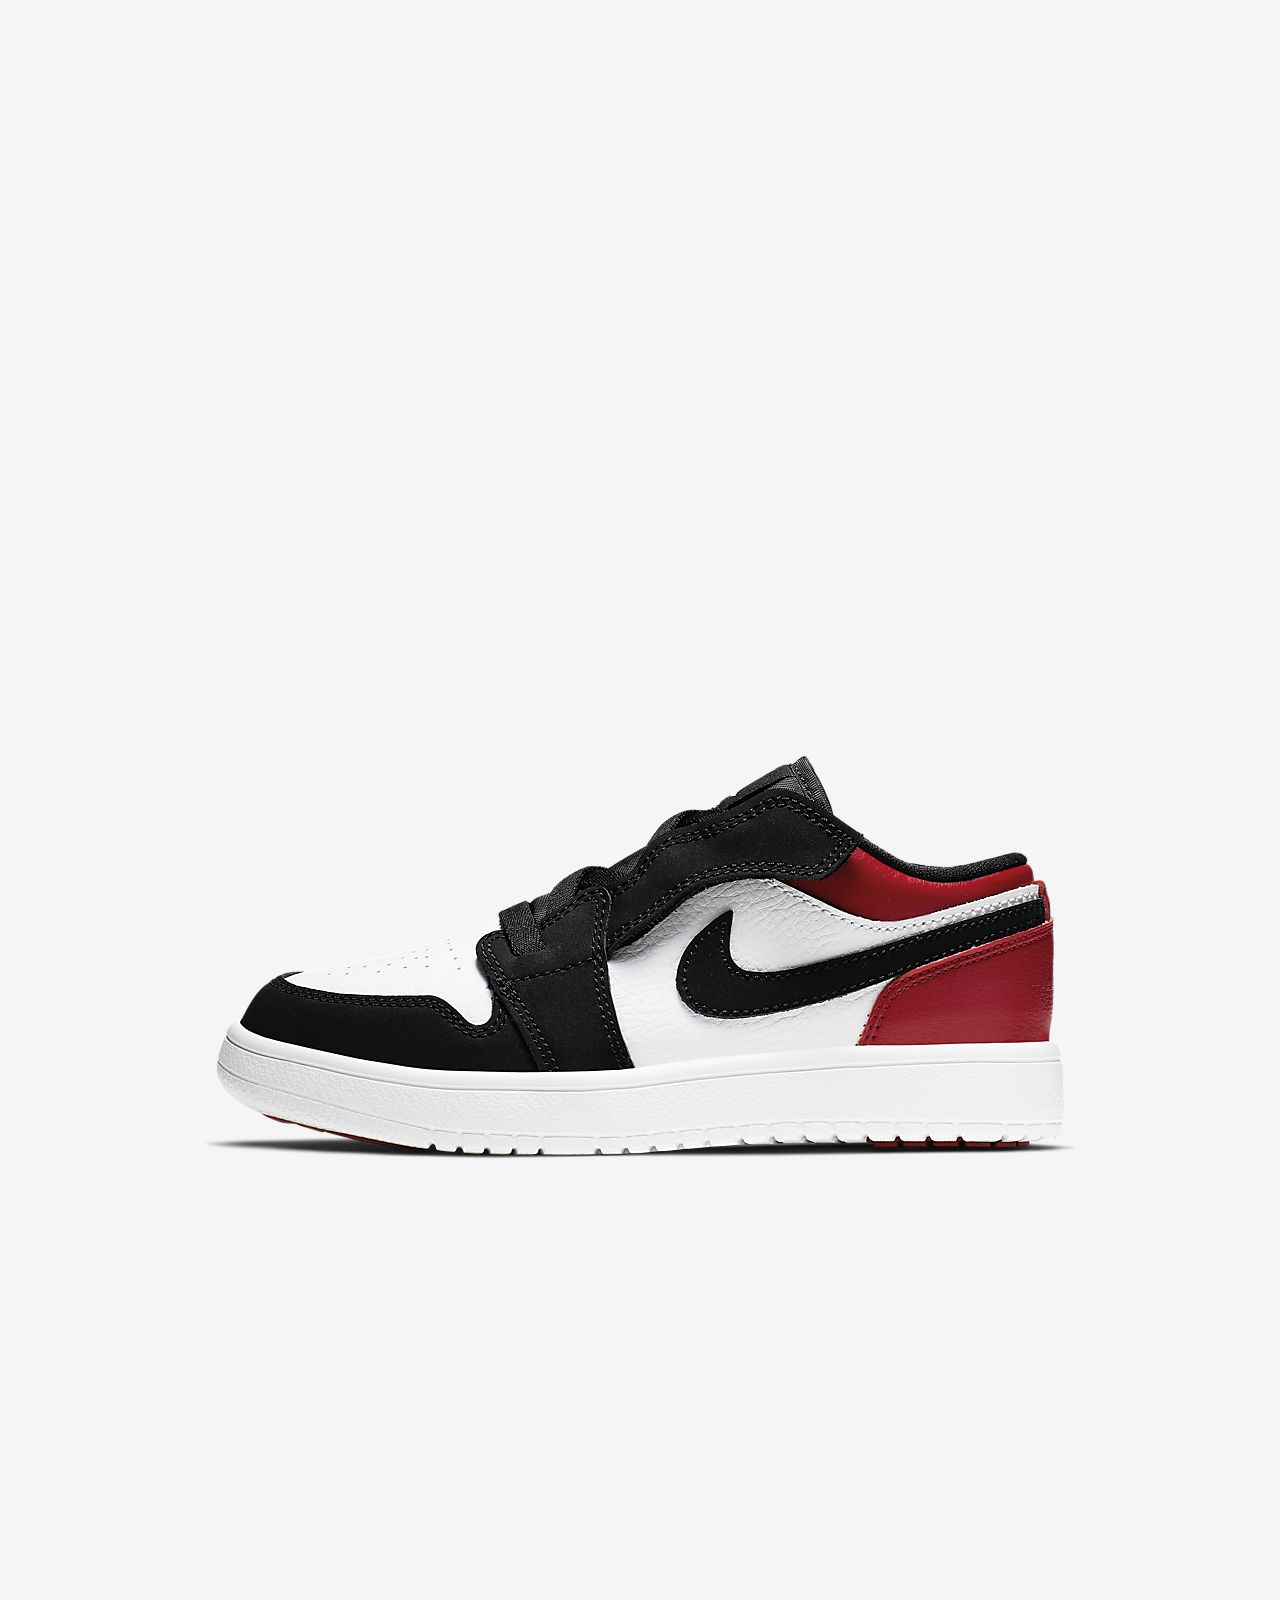 jüngere Schuh für Kinder 1 Alt Low Jordan uikXPZ